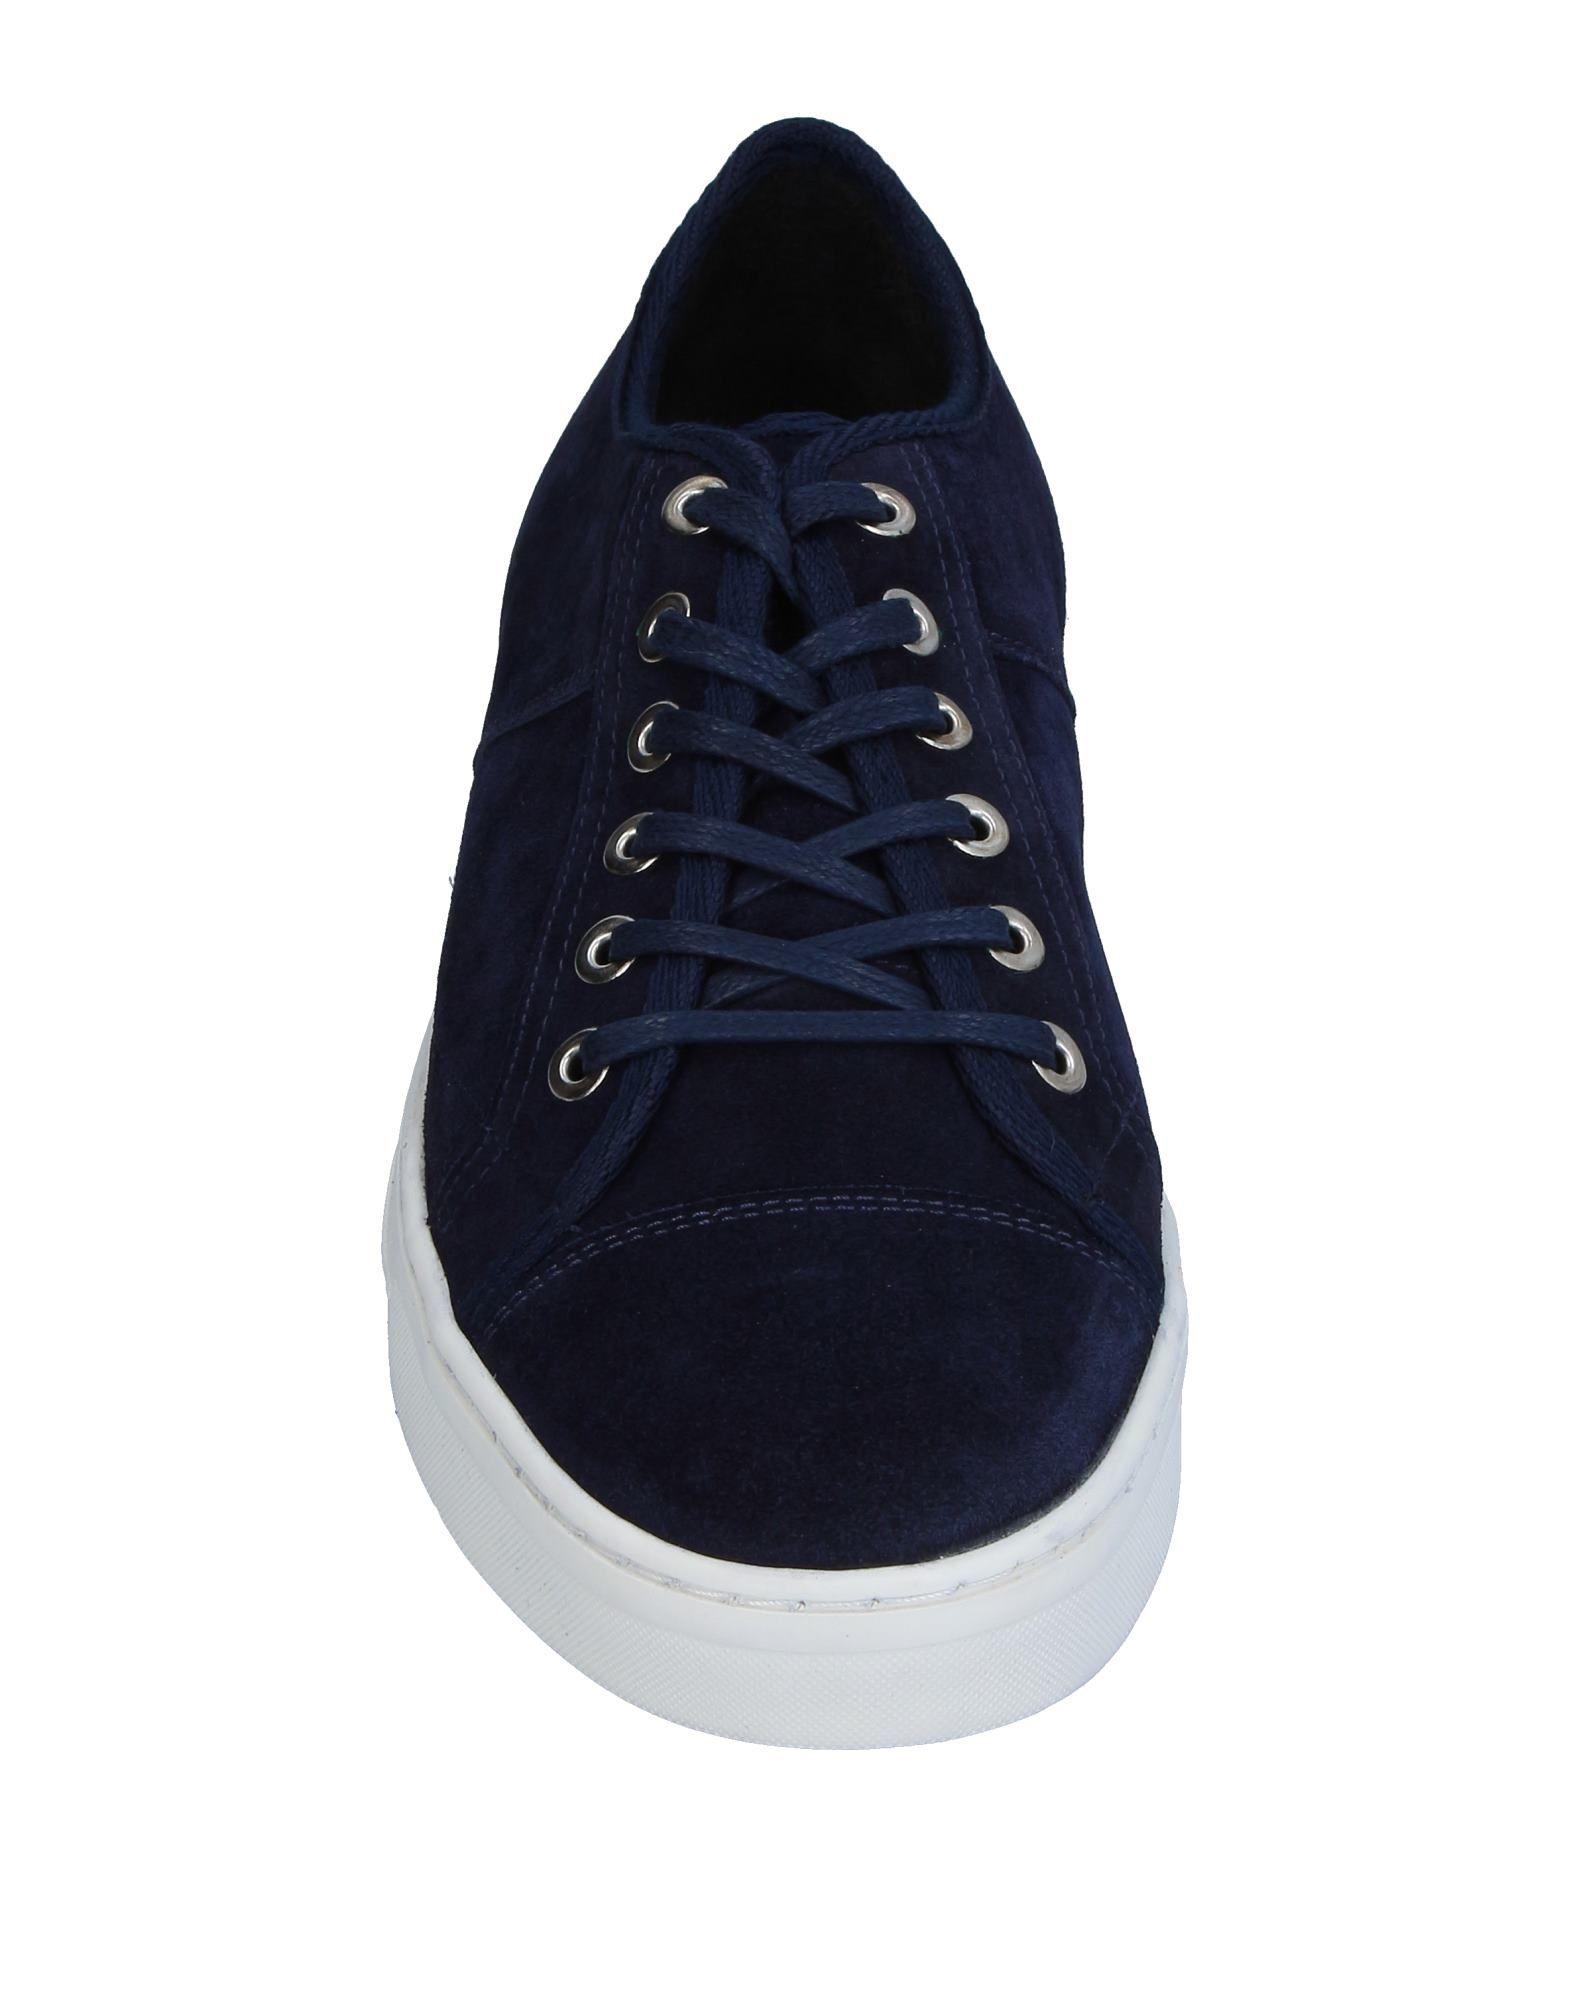 Neil Barrett Sneakers Herren  11339435KL Gute Qualität beliebte Schuhe